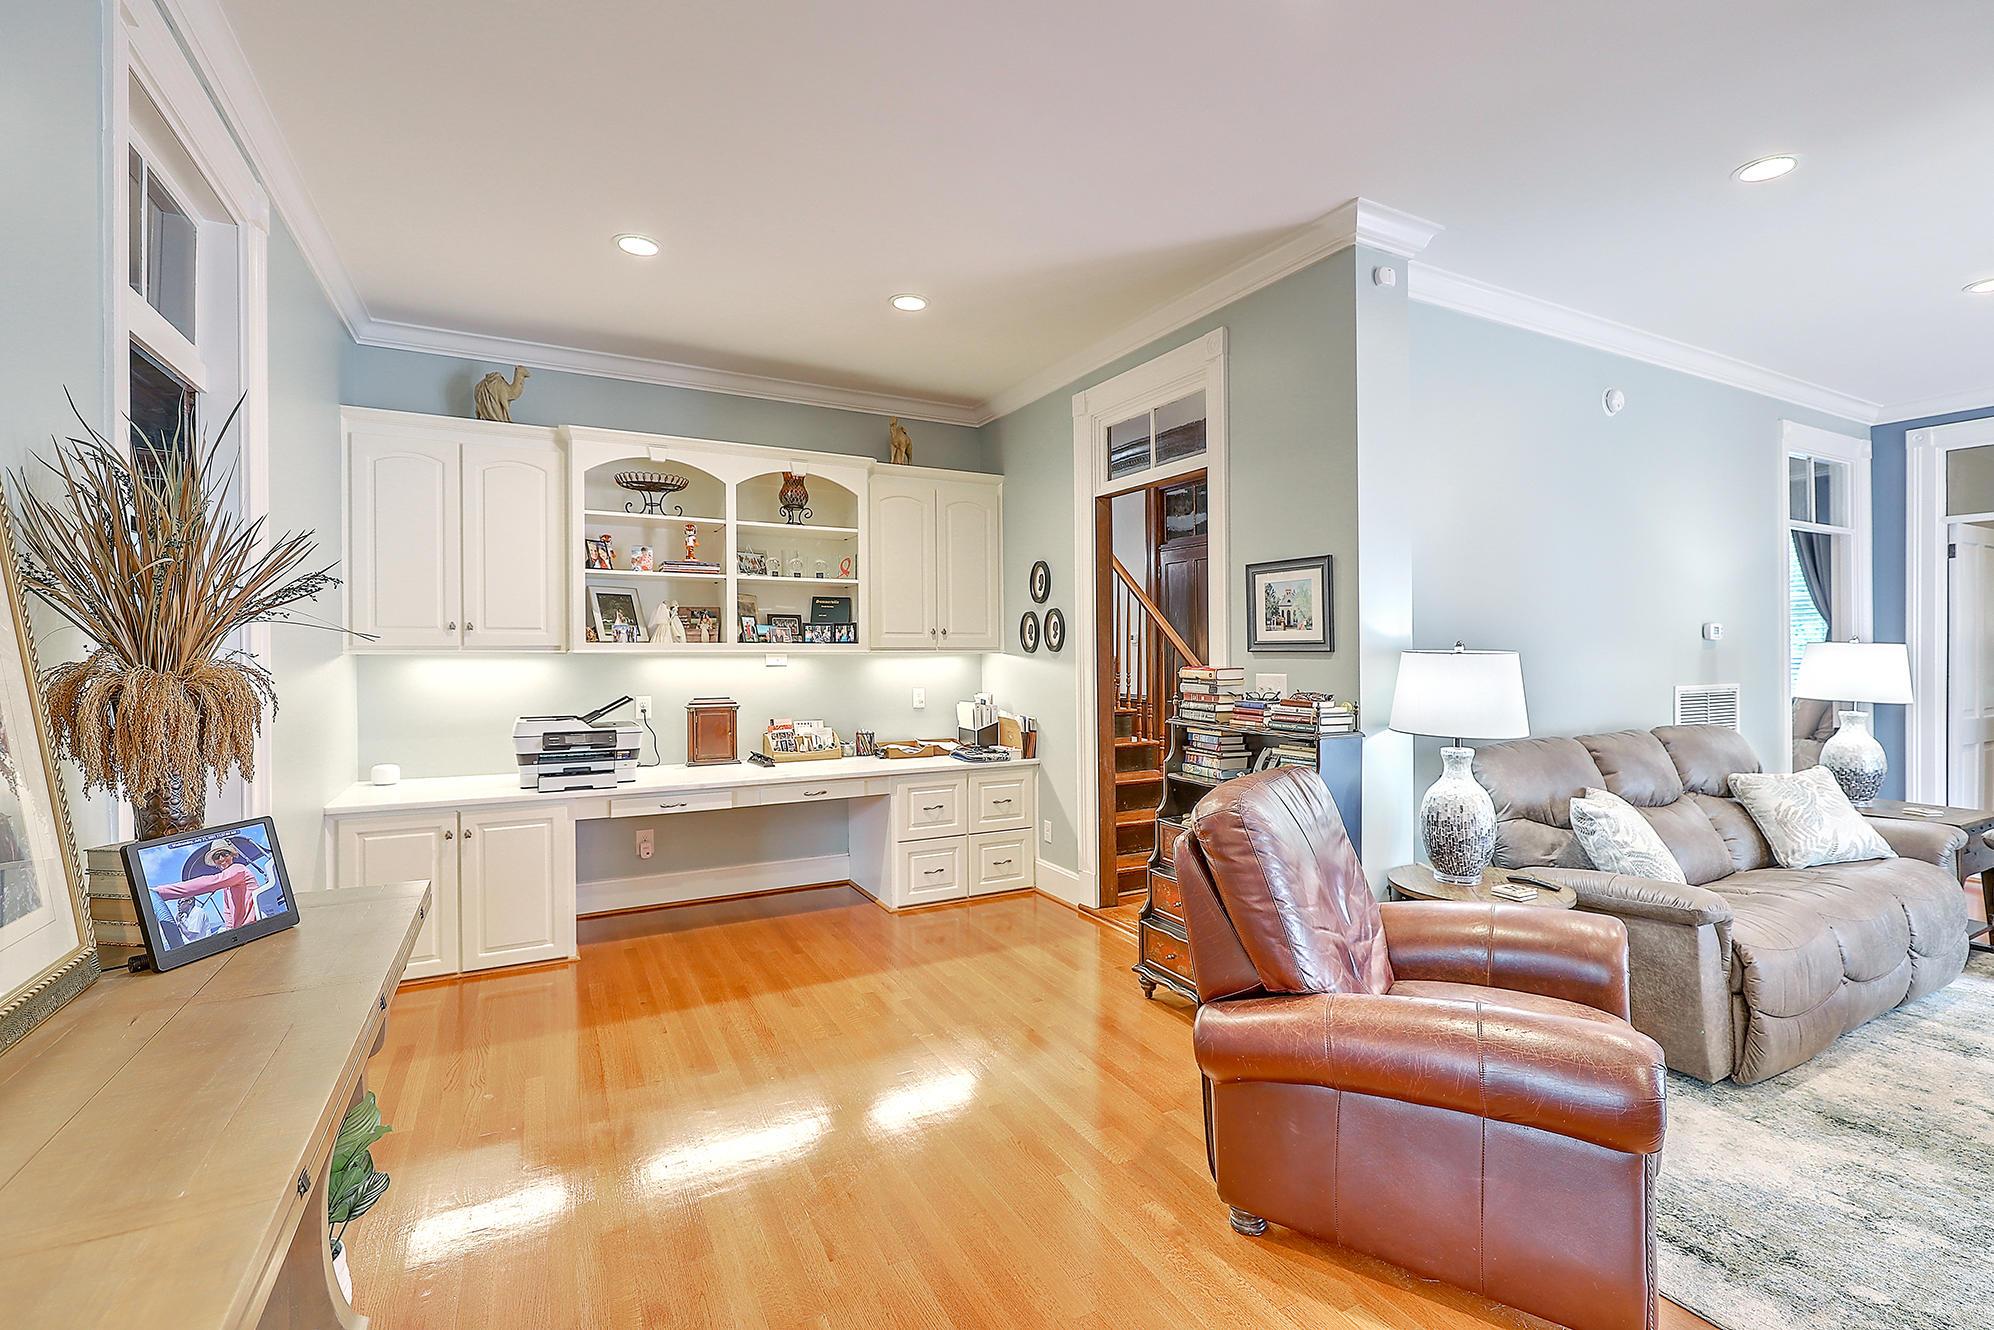 Summerville Homes For Sale - 102 Hickory, Summerville, SC - 56